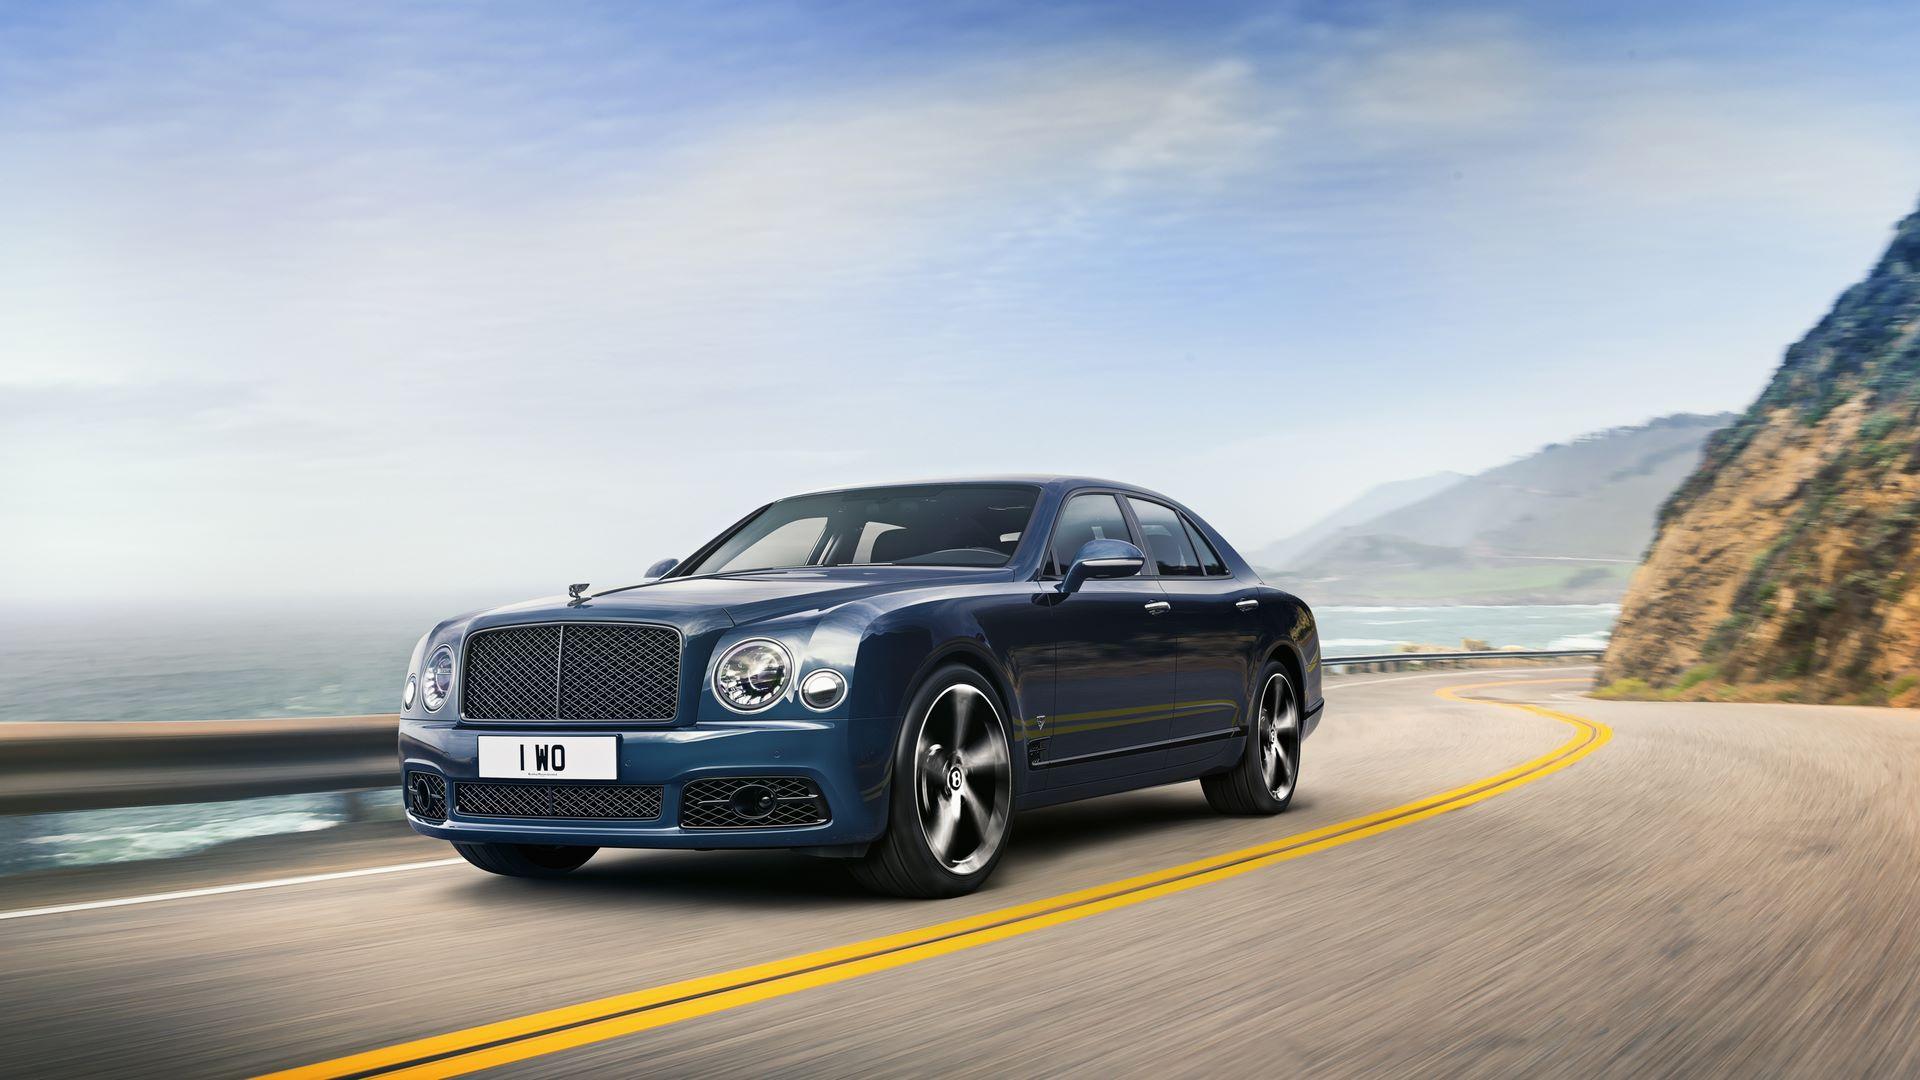 Bentley-Mulsanne-6.75-Edition-By-Mulliner-1